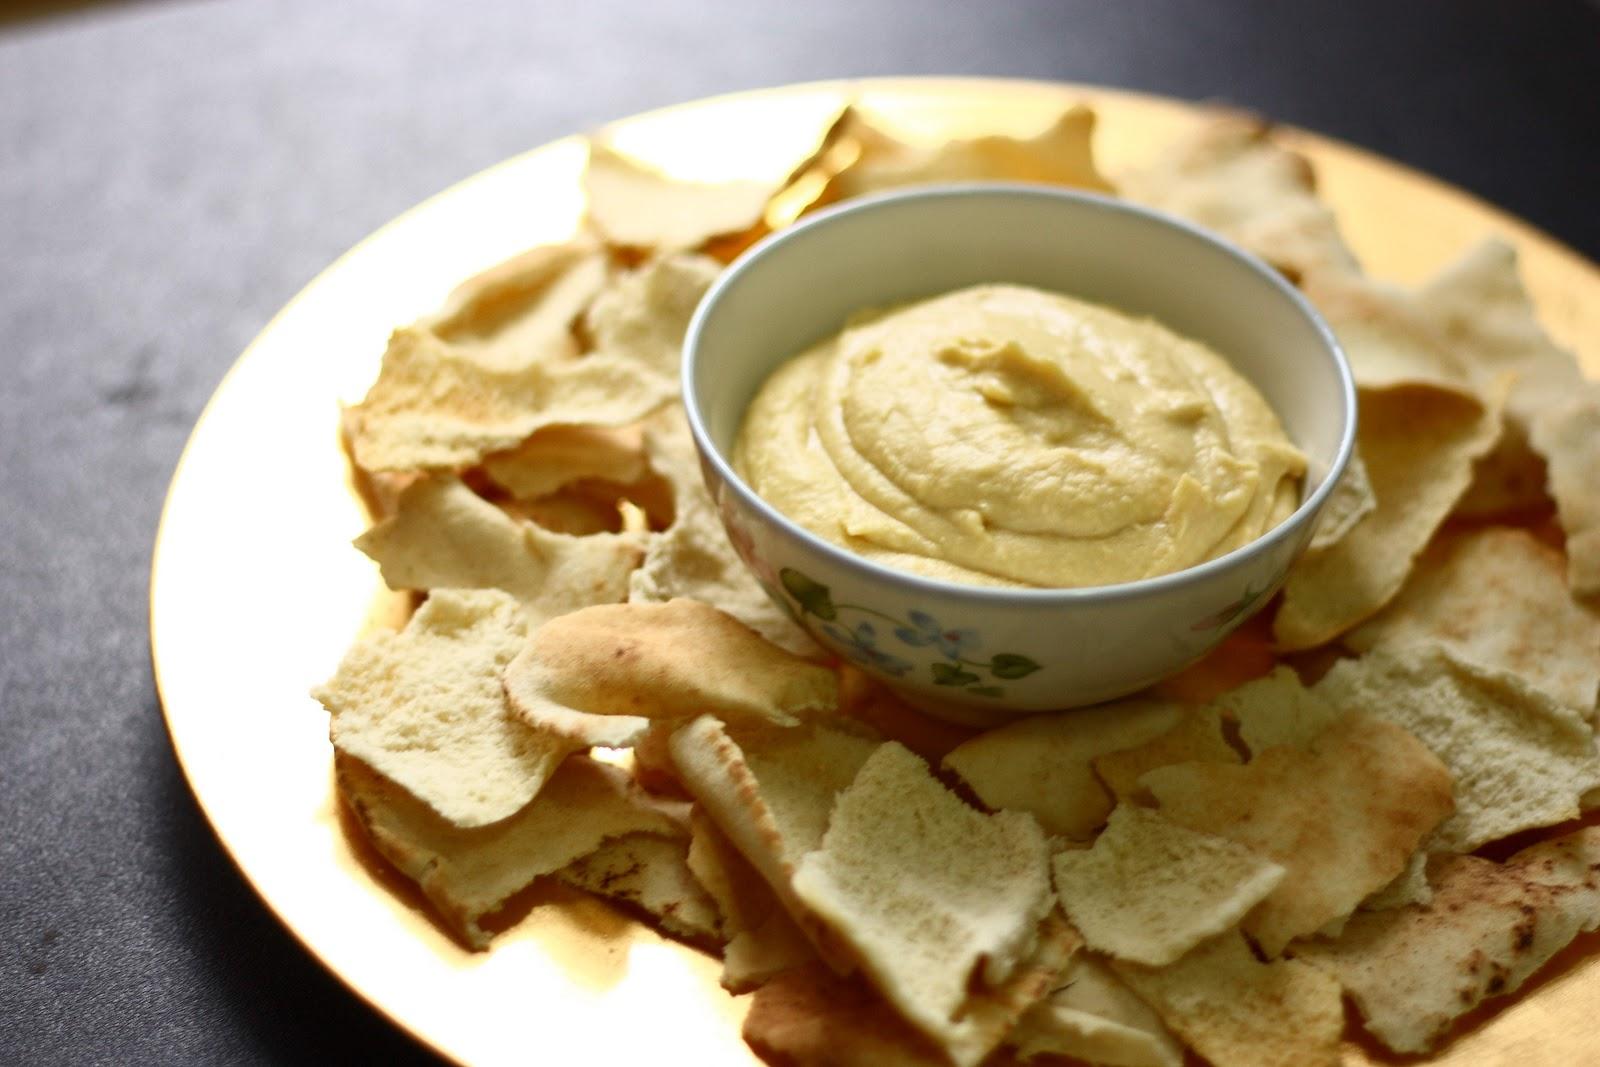 Creamy Homemade Hummus | alimentageuse.com #vegan #hummus